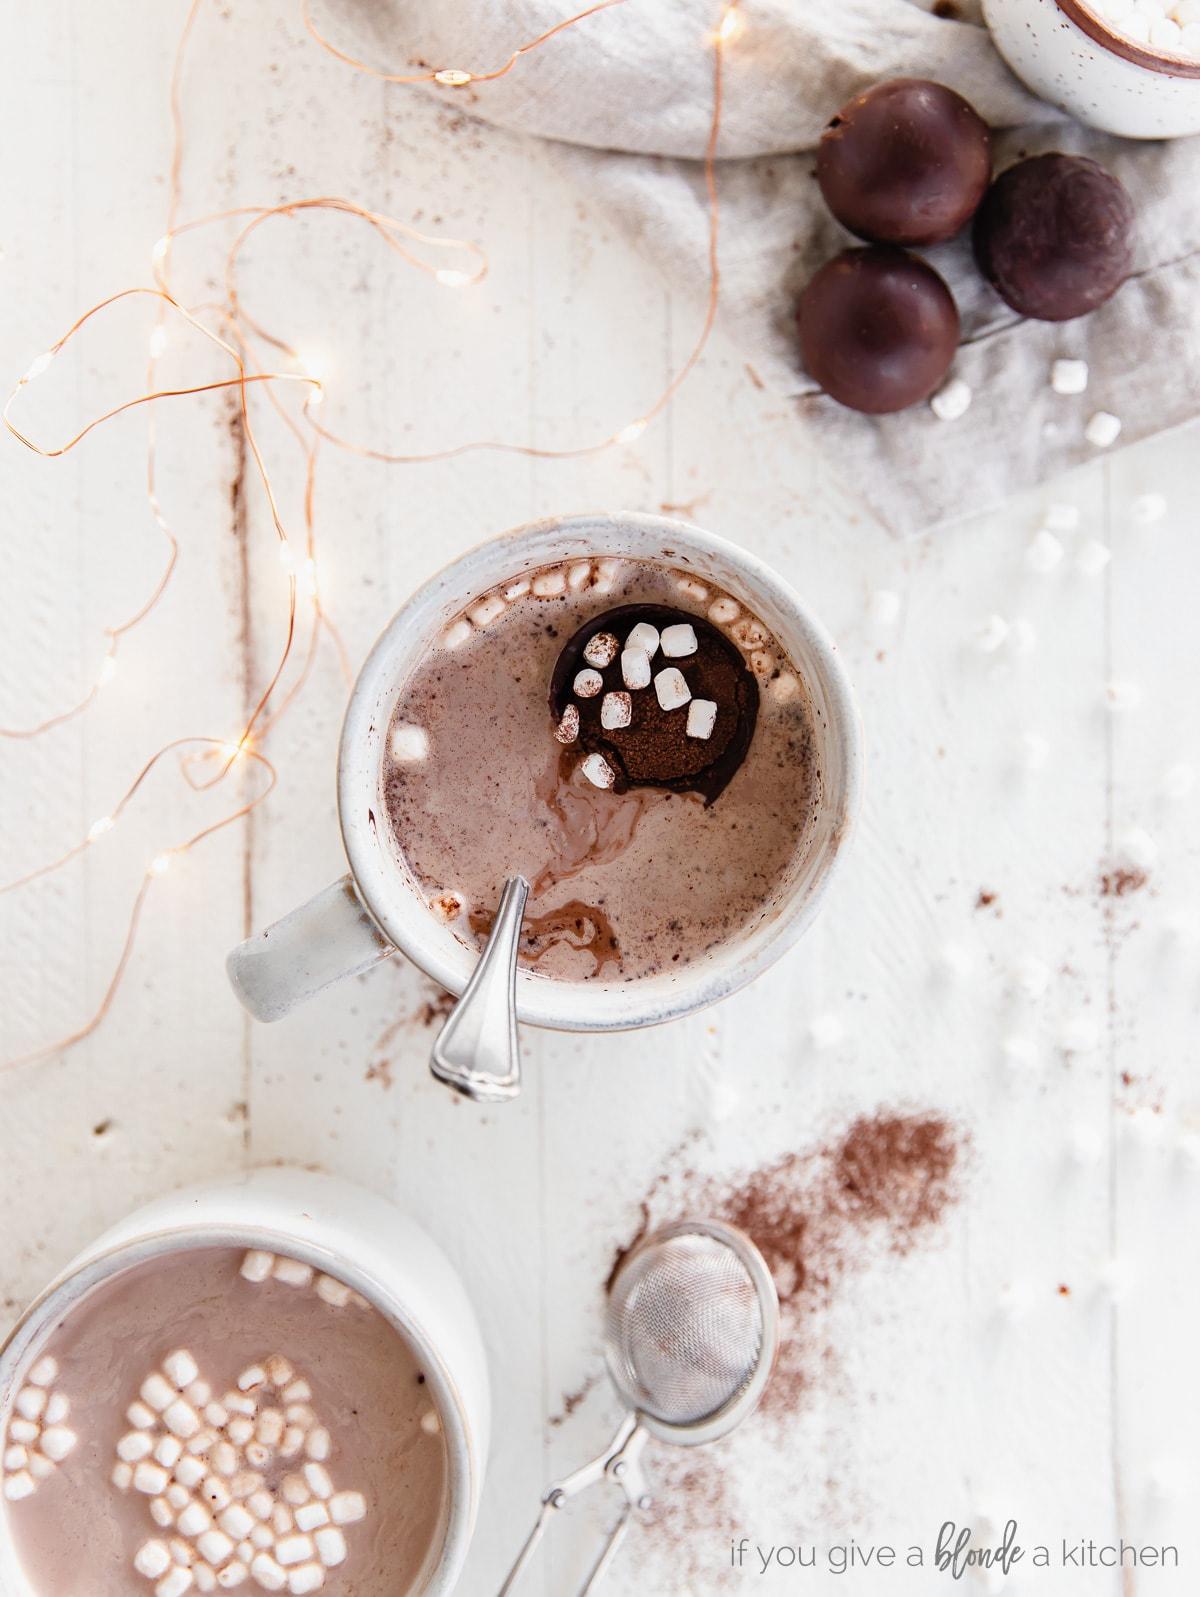 mug of hot chocolate with floating hot chocolate bomb and mini marshmallows inside